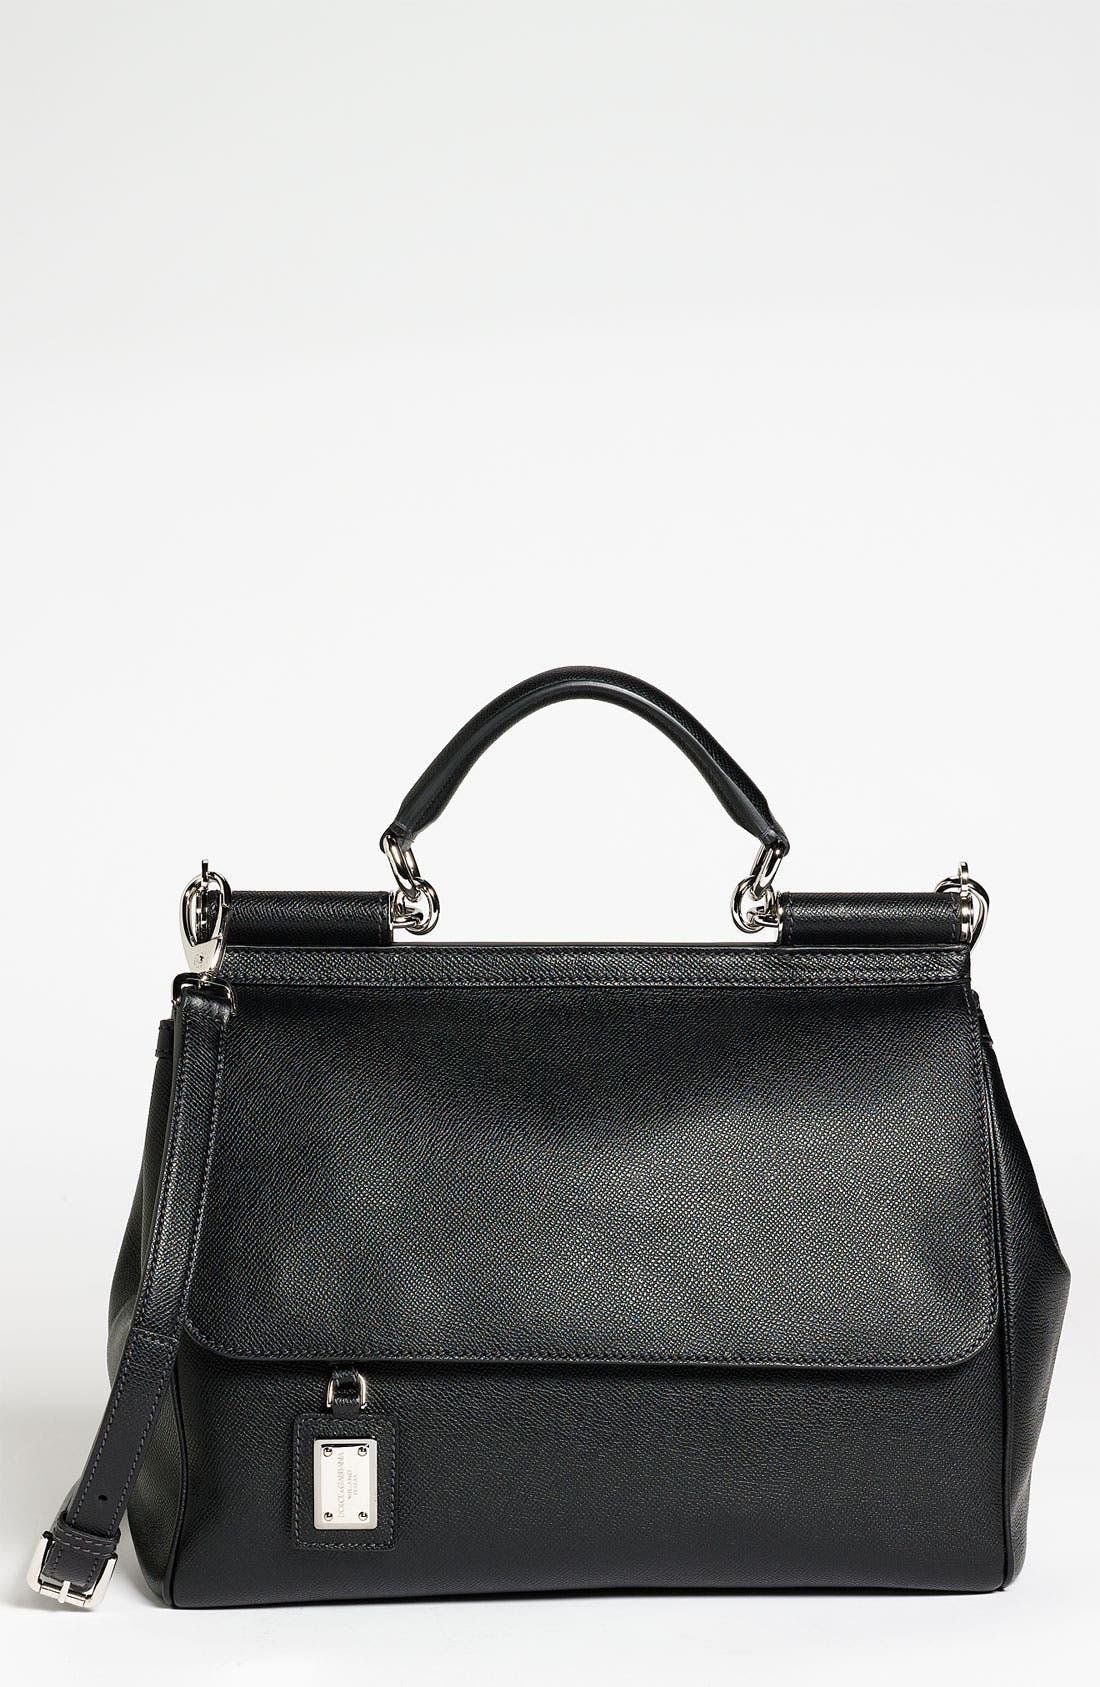 Main Image - Dolce&Gabbana 'Miss Mamma' Leather Satchel